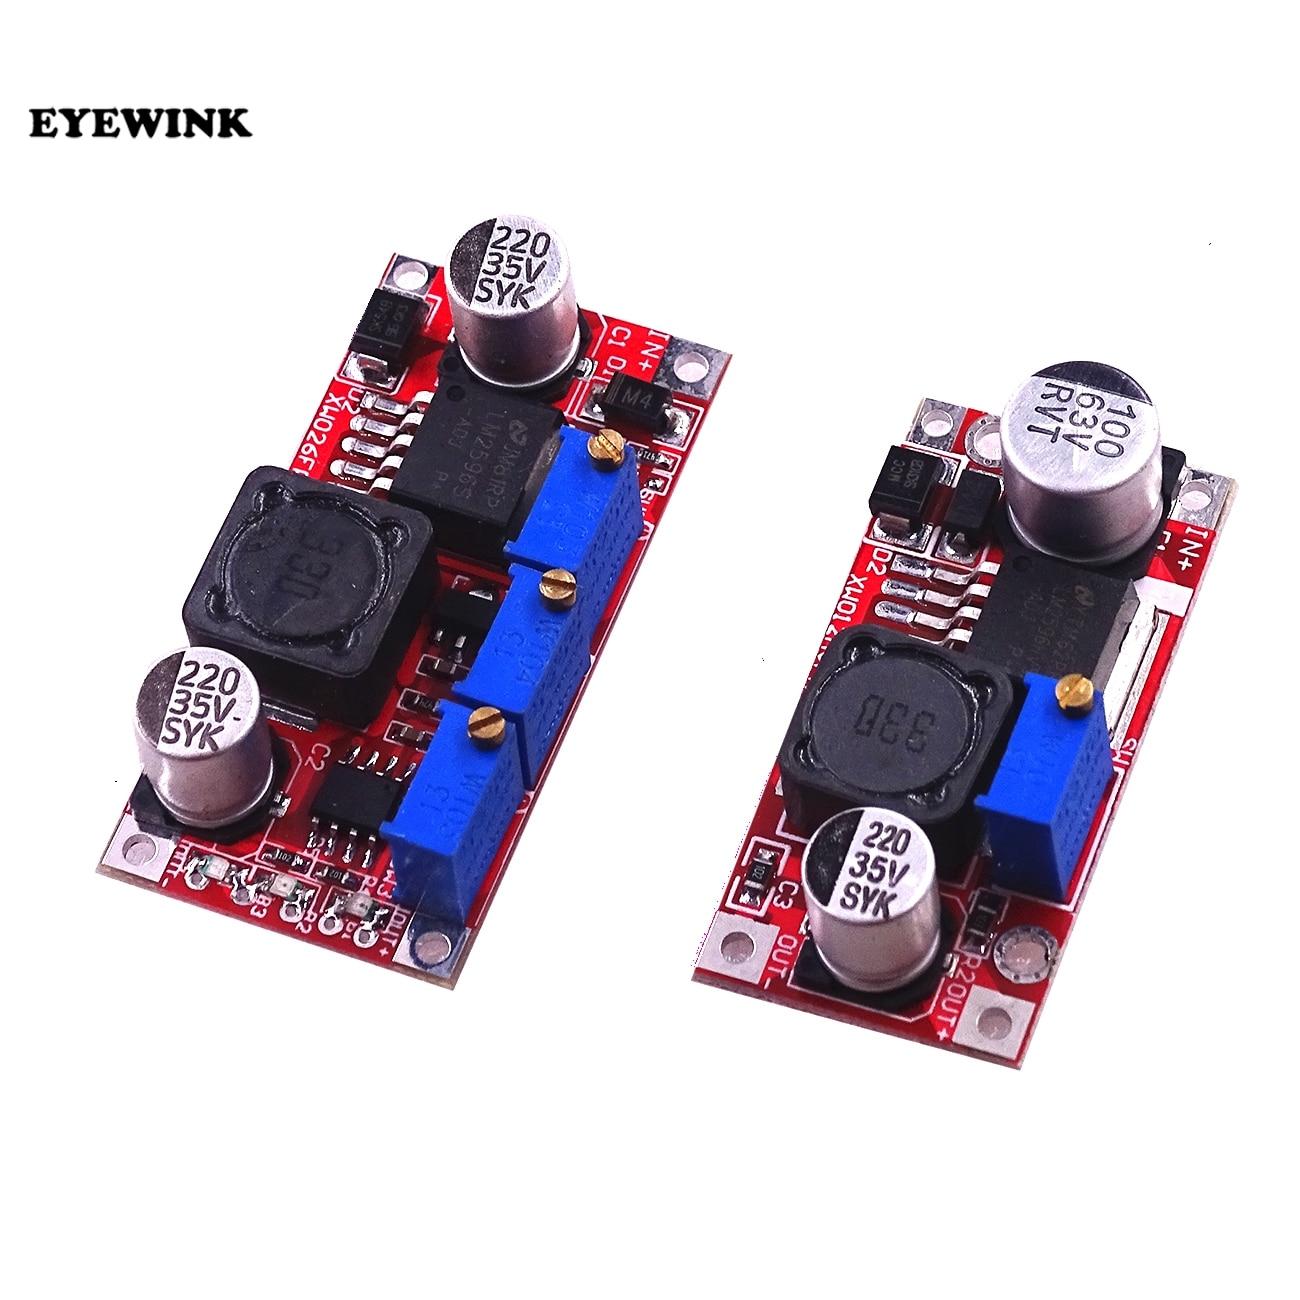 LM2596 XL6009//LM2577 LM2596 LM2596 //LM2596HVS Power Converter Voltmeter